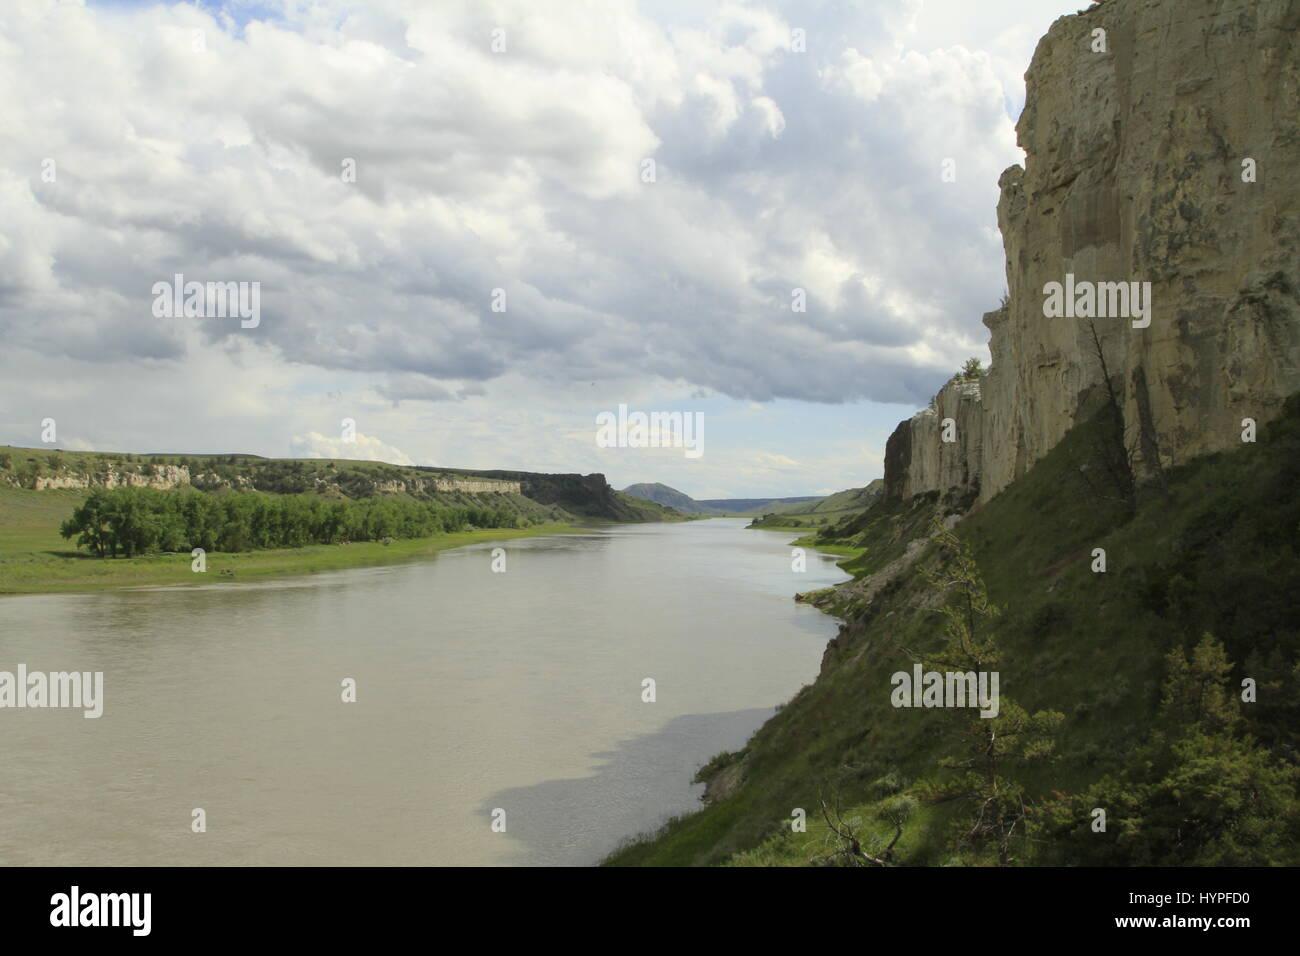 White Cliffs Region of the Missouri River Breaks National Monument, Montana, USA - Stock Image